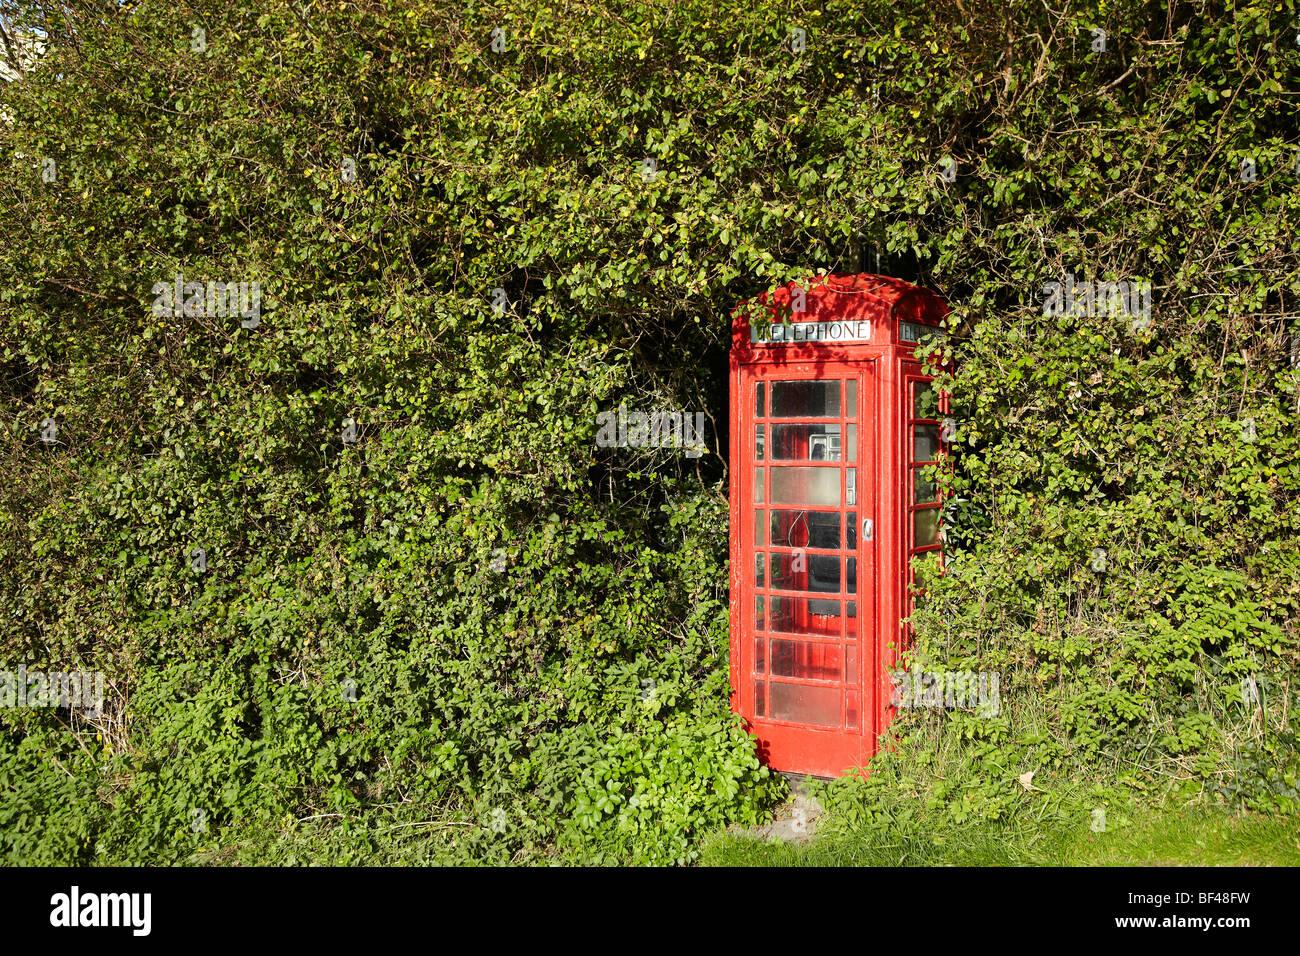 Red Telephone Kiosk in Ceredigion, West Wales, UK - Stock Image